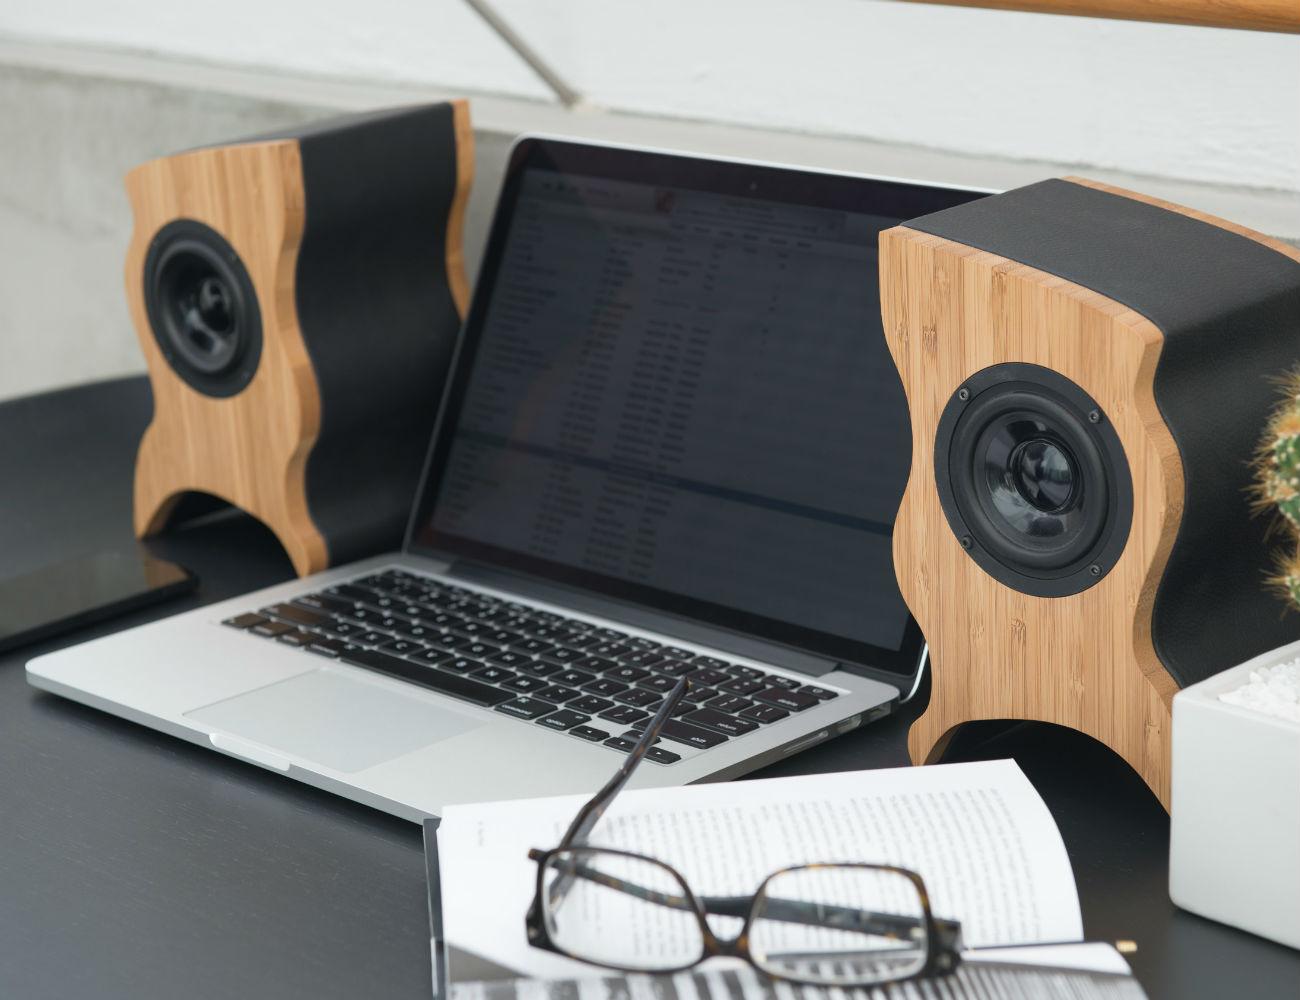 Talisman Desktop Speakers by Serene Audio